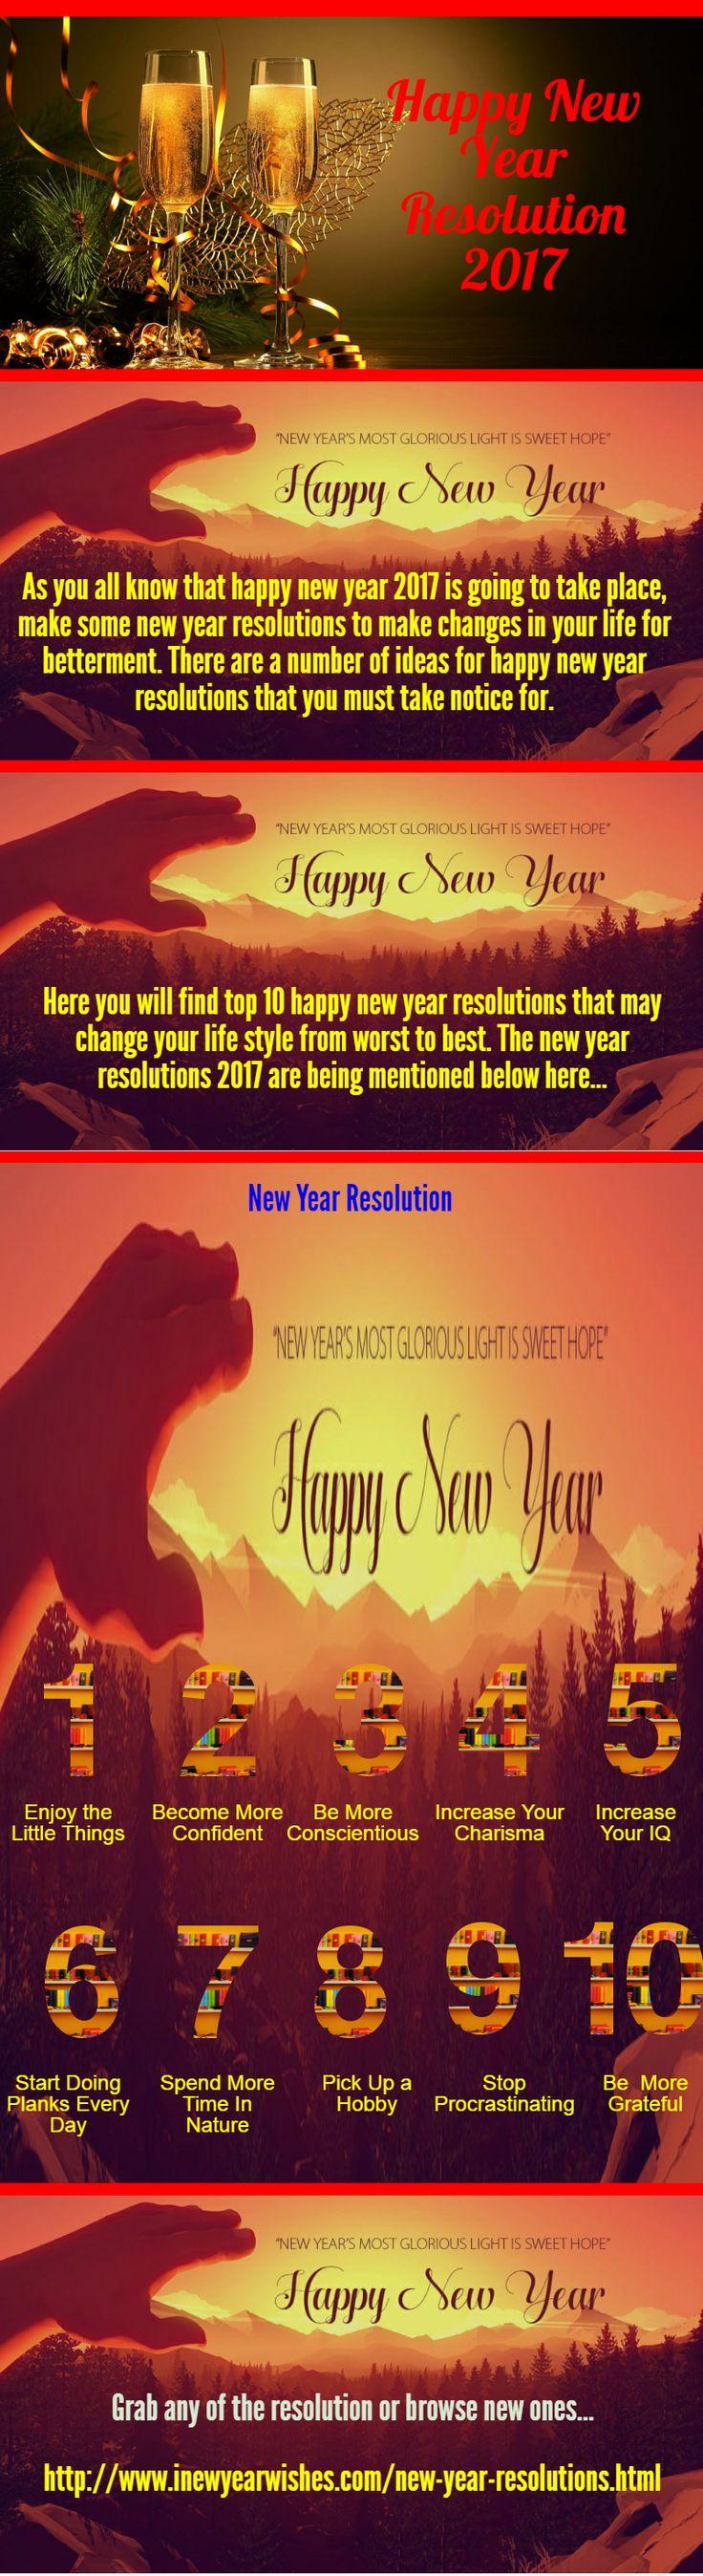 wedding anniversary wishes shayari in hindi%0A New Year Resolutions